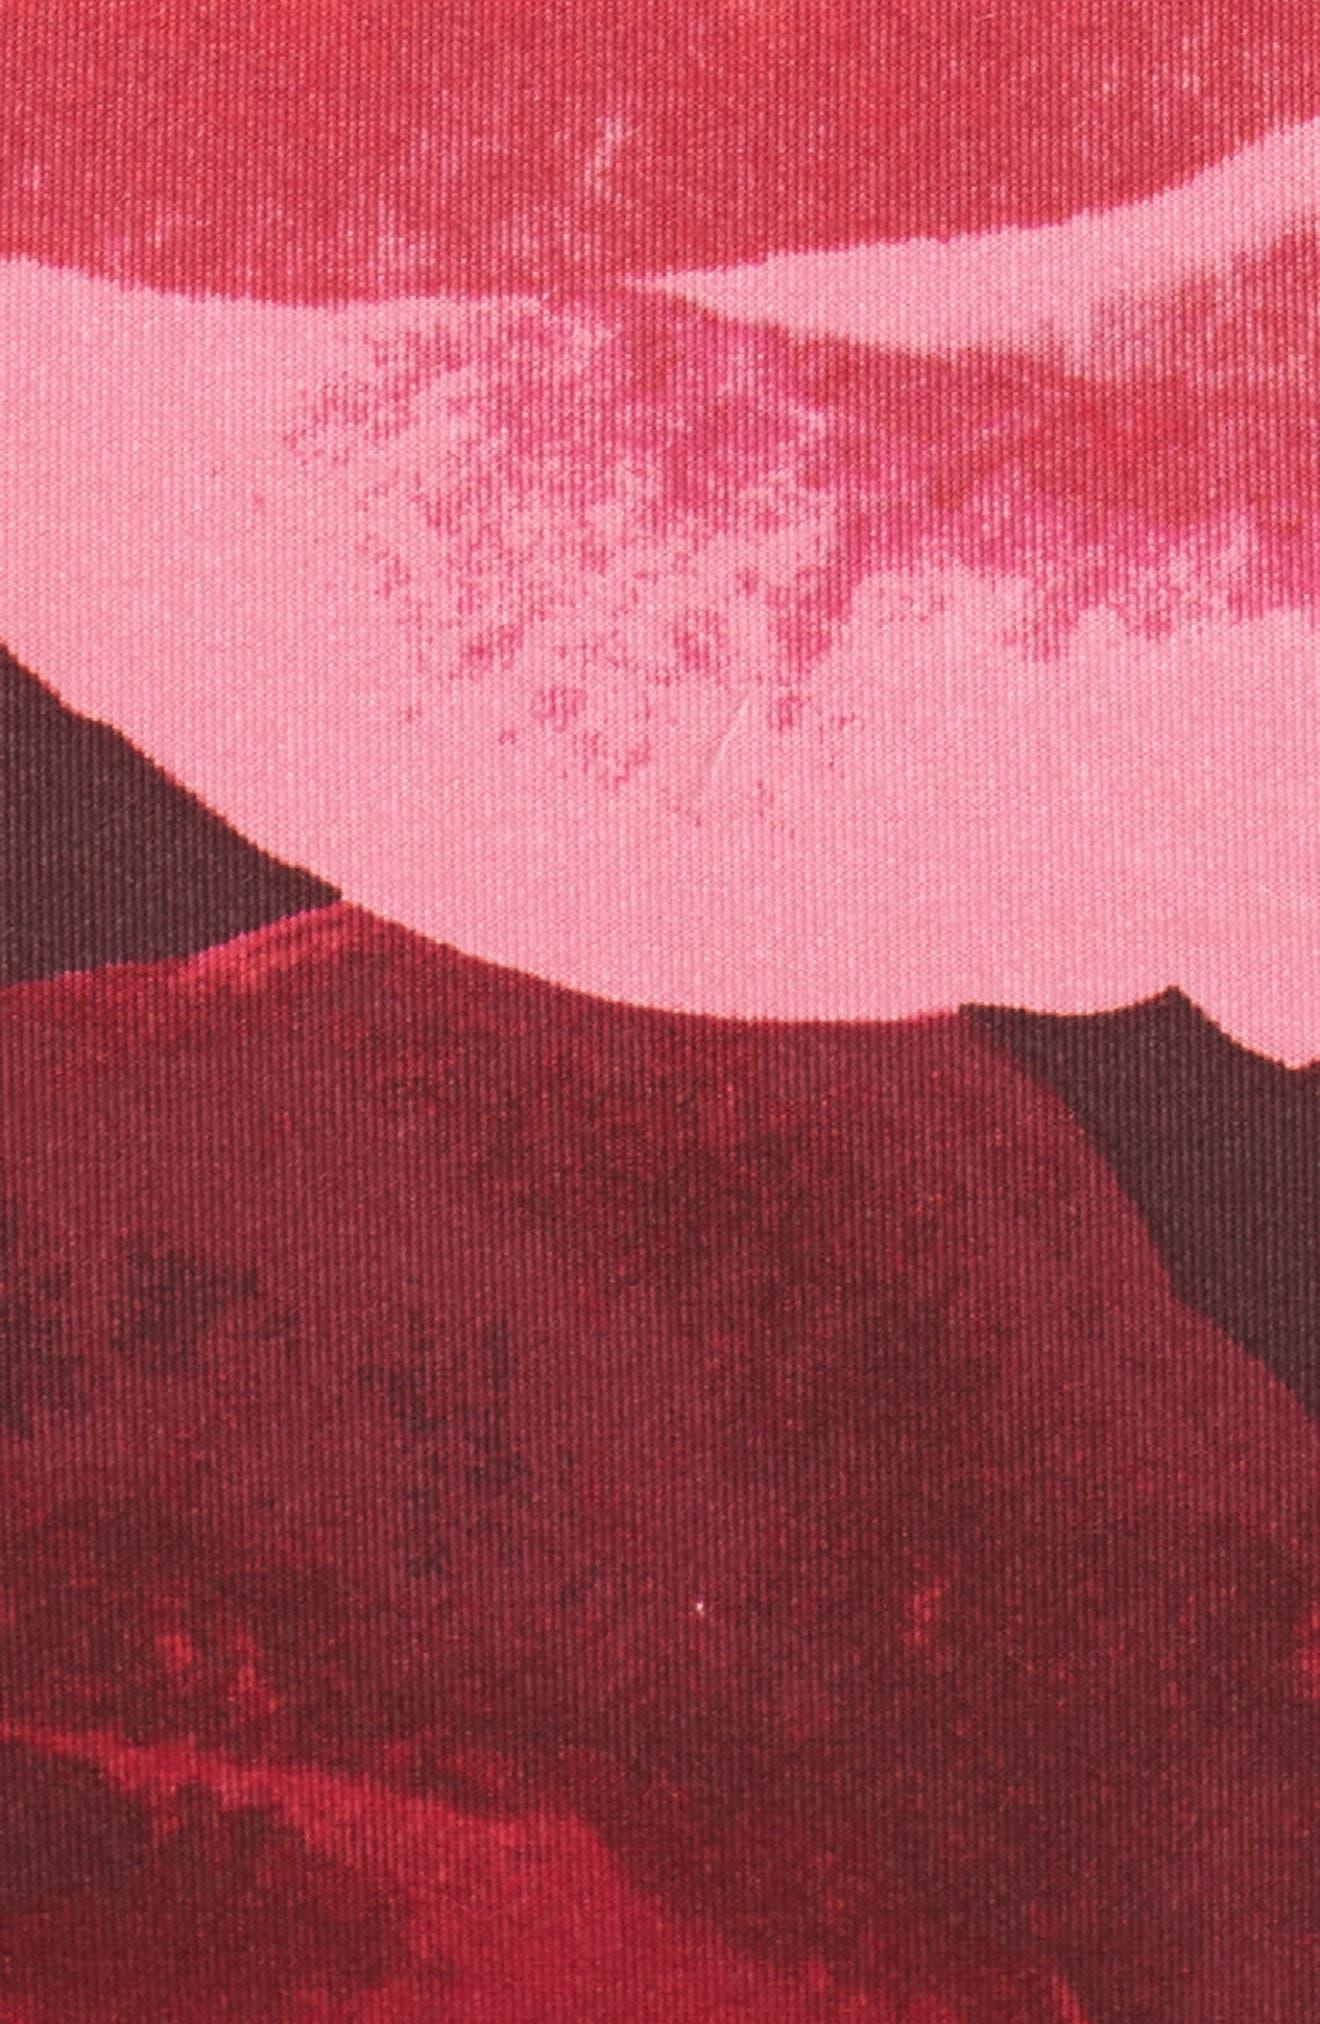 Floral Print Scuba Crepe Dress,                             Alternate thumbnail 5, color,                             Magenta